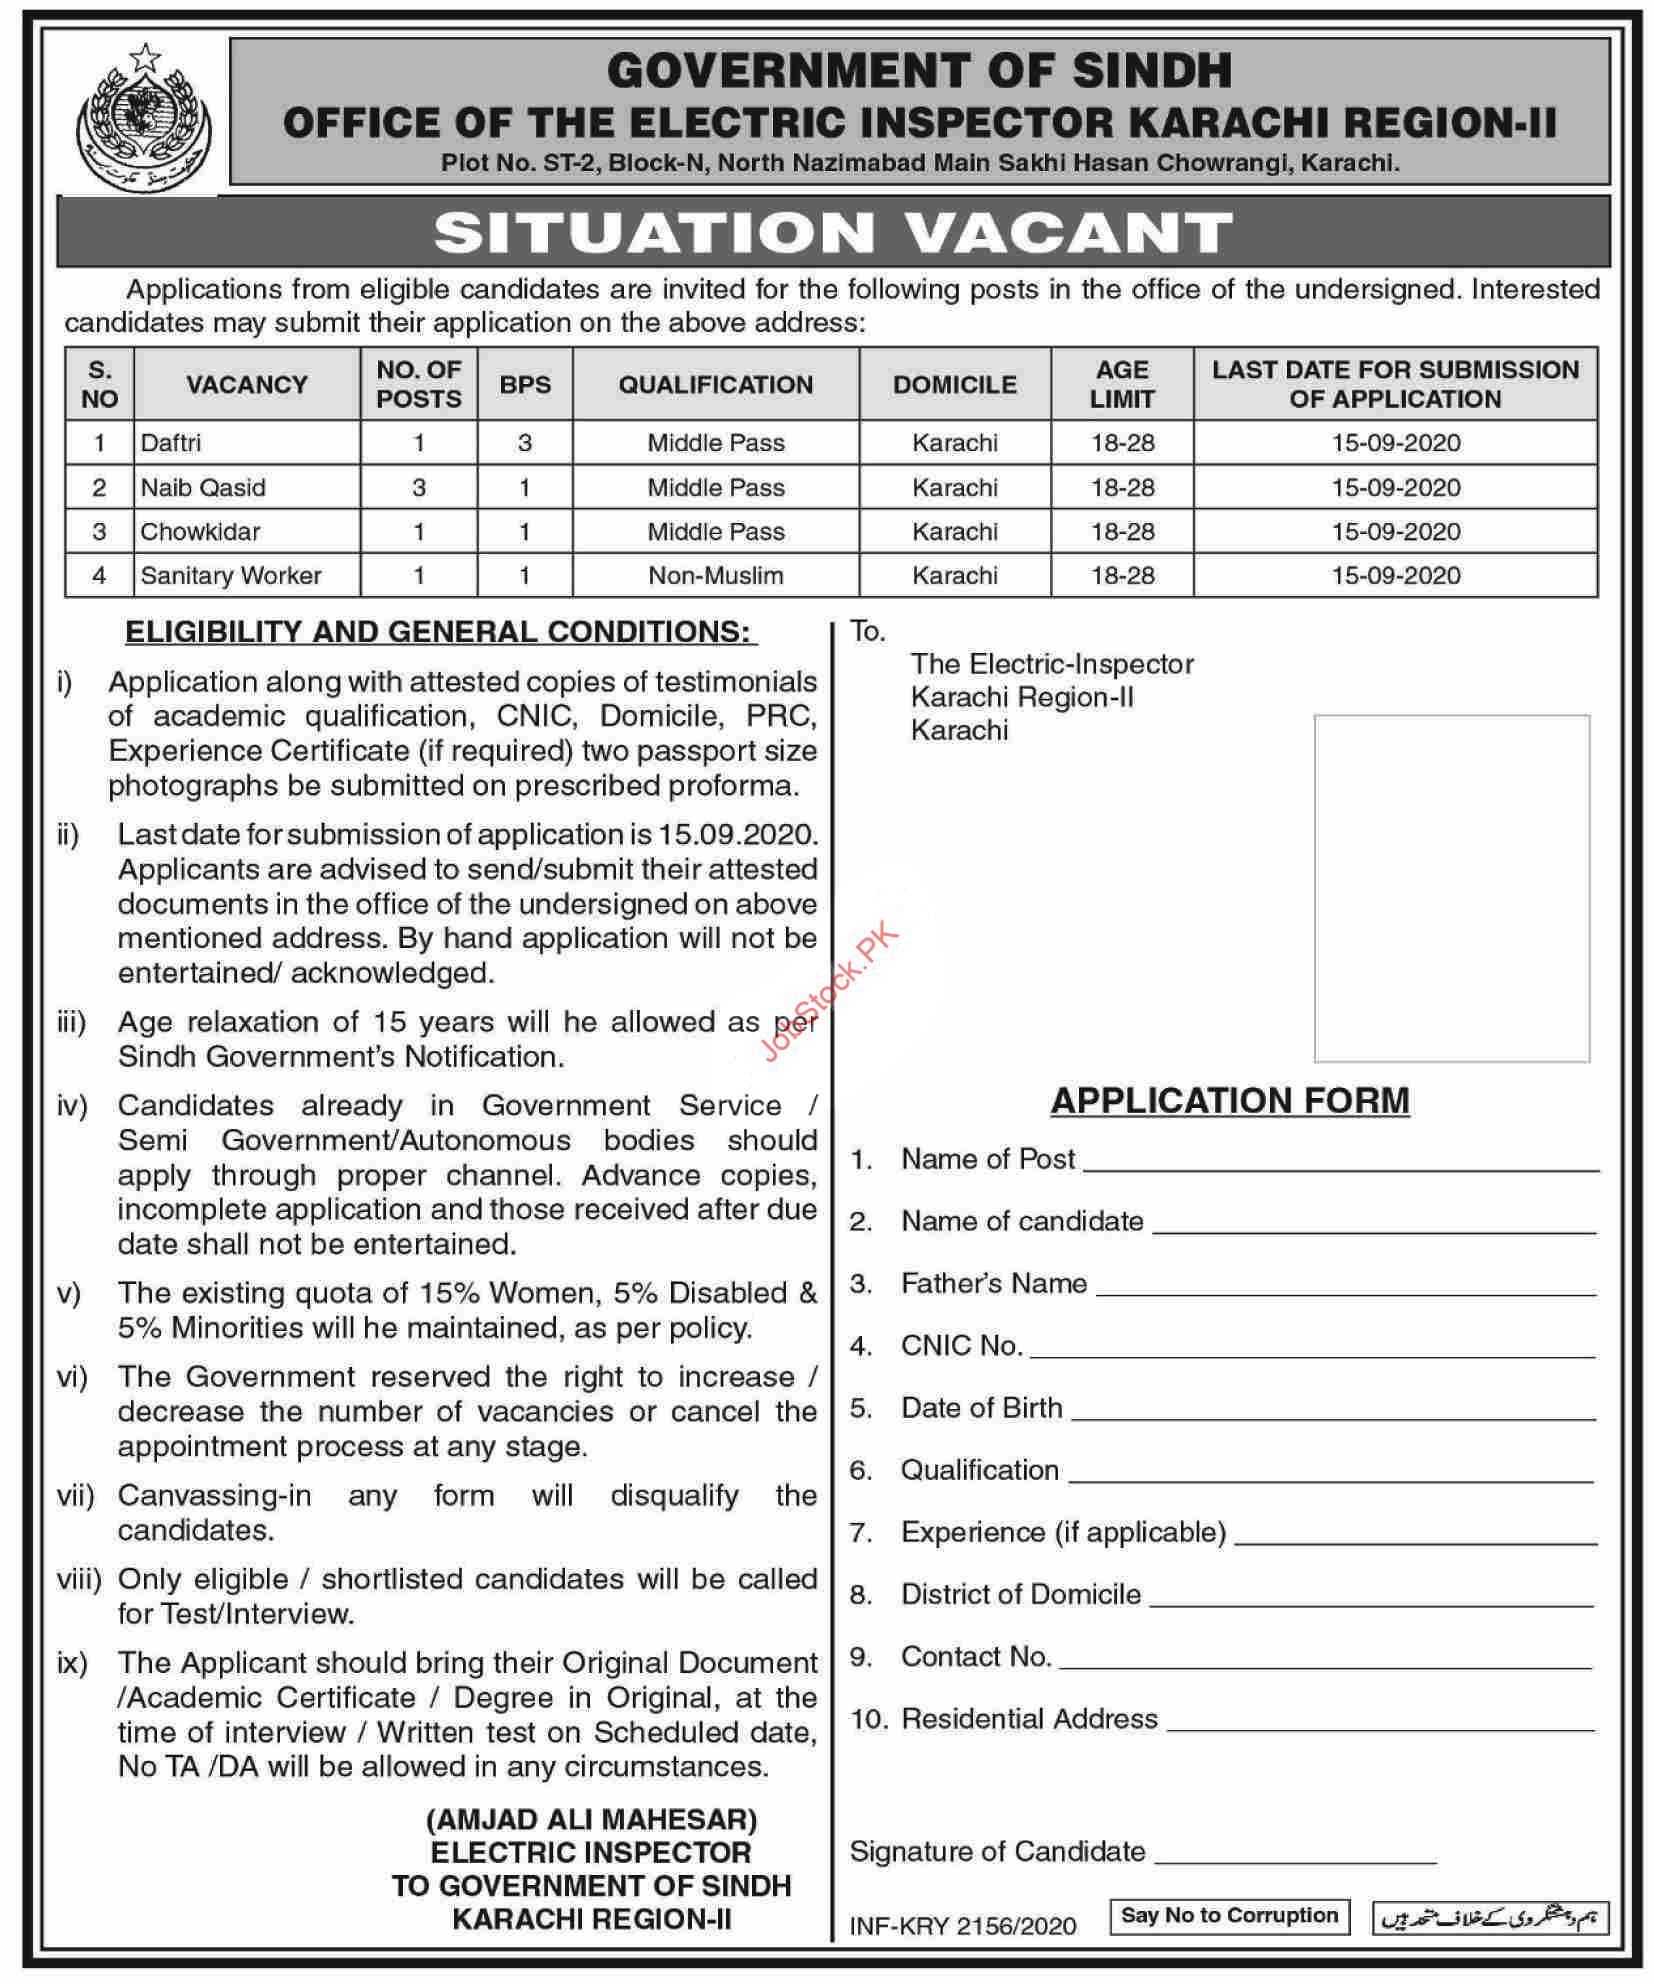 Electric Inspector Office Karachi Region Jobs 2020 Latest